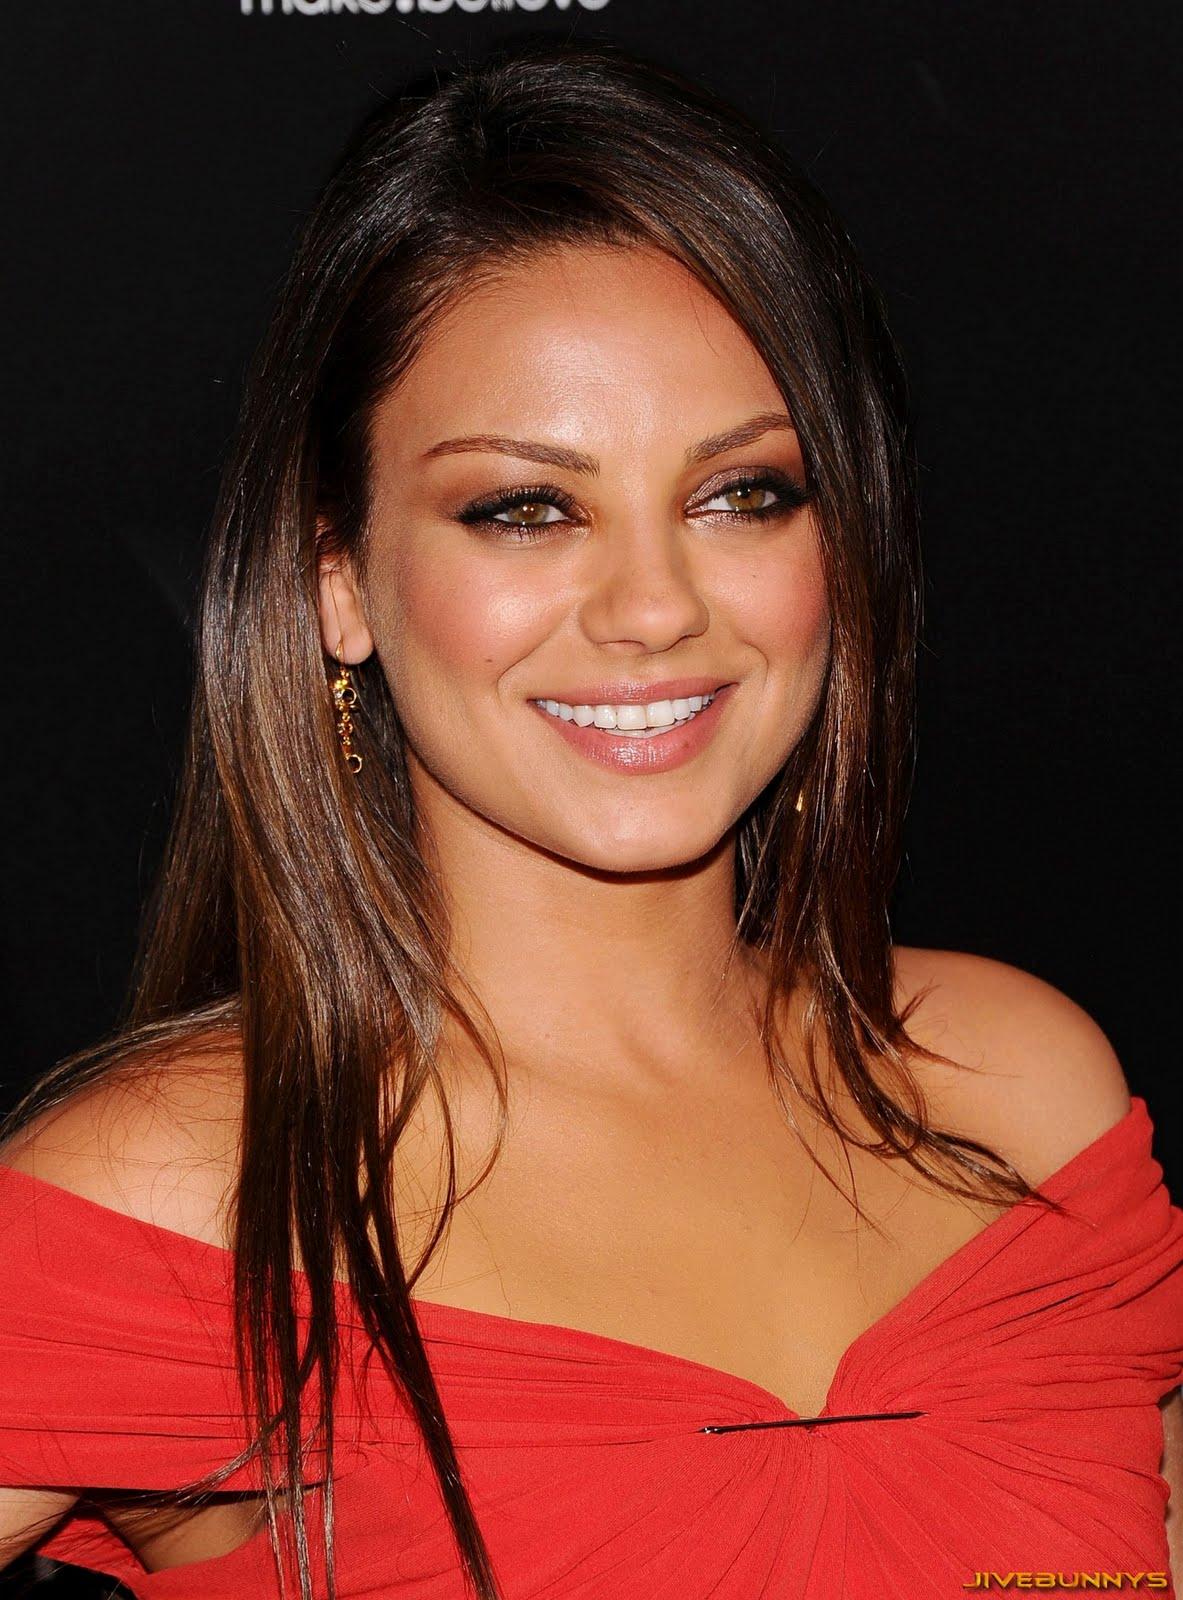 http://1.bp.blogspot.com/-ULJ9NNuQL9o/TiehBVBKAQI/AAAAAAACq_k/lFIJgkSDuK4/s1600/mila-kunis-actress-celebrities-3123.jpg